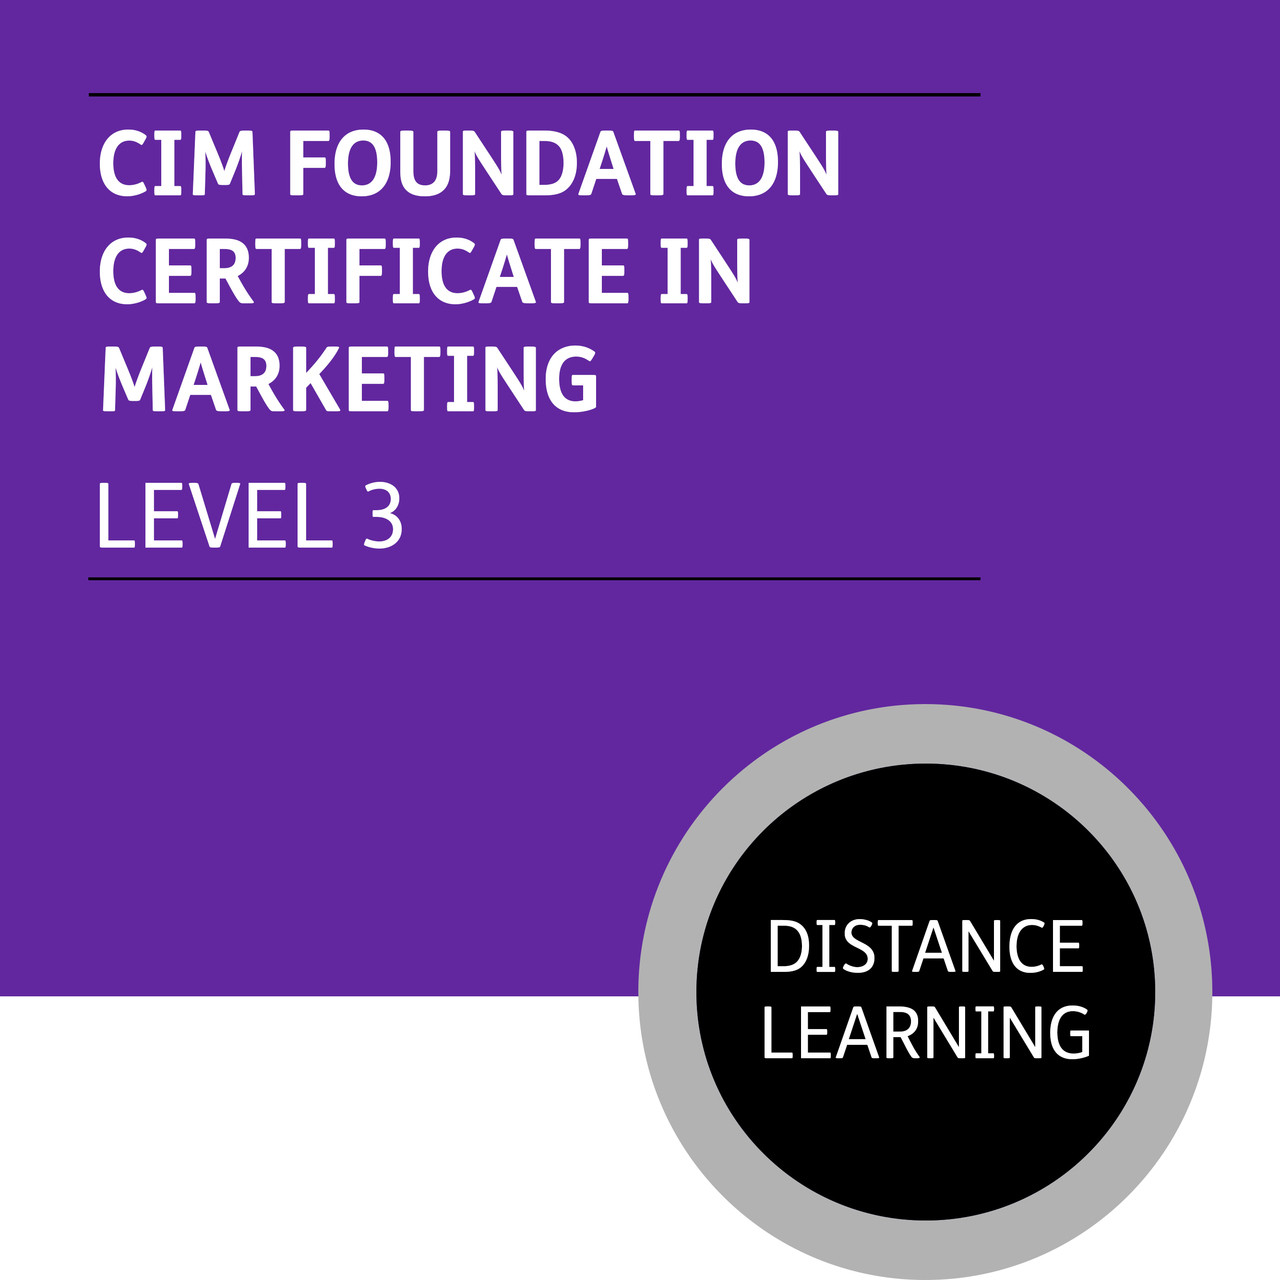 Cim Foundation Certificate In Marketing Level 3 Distance